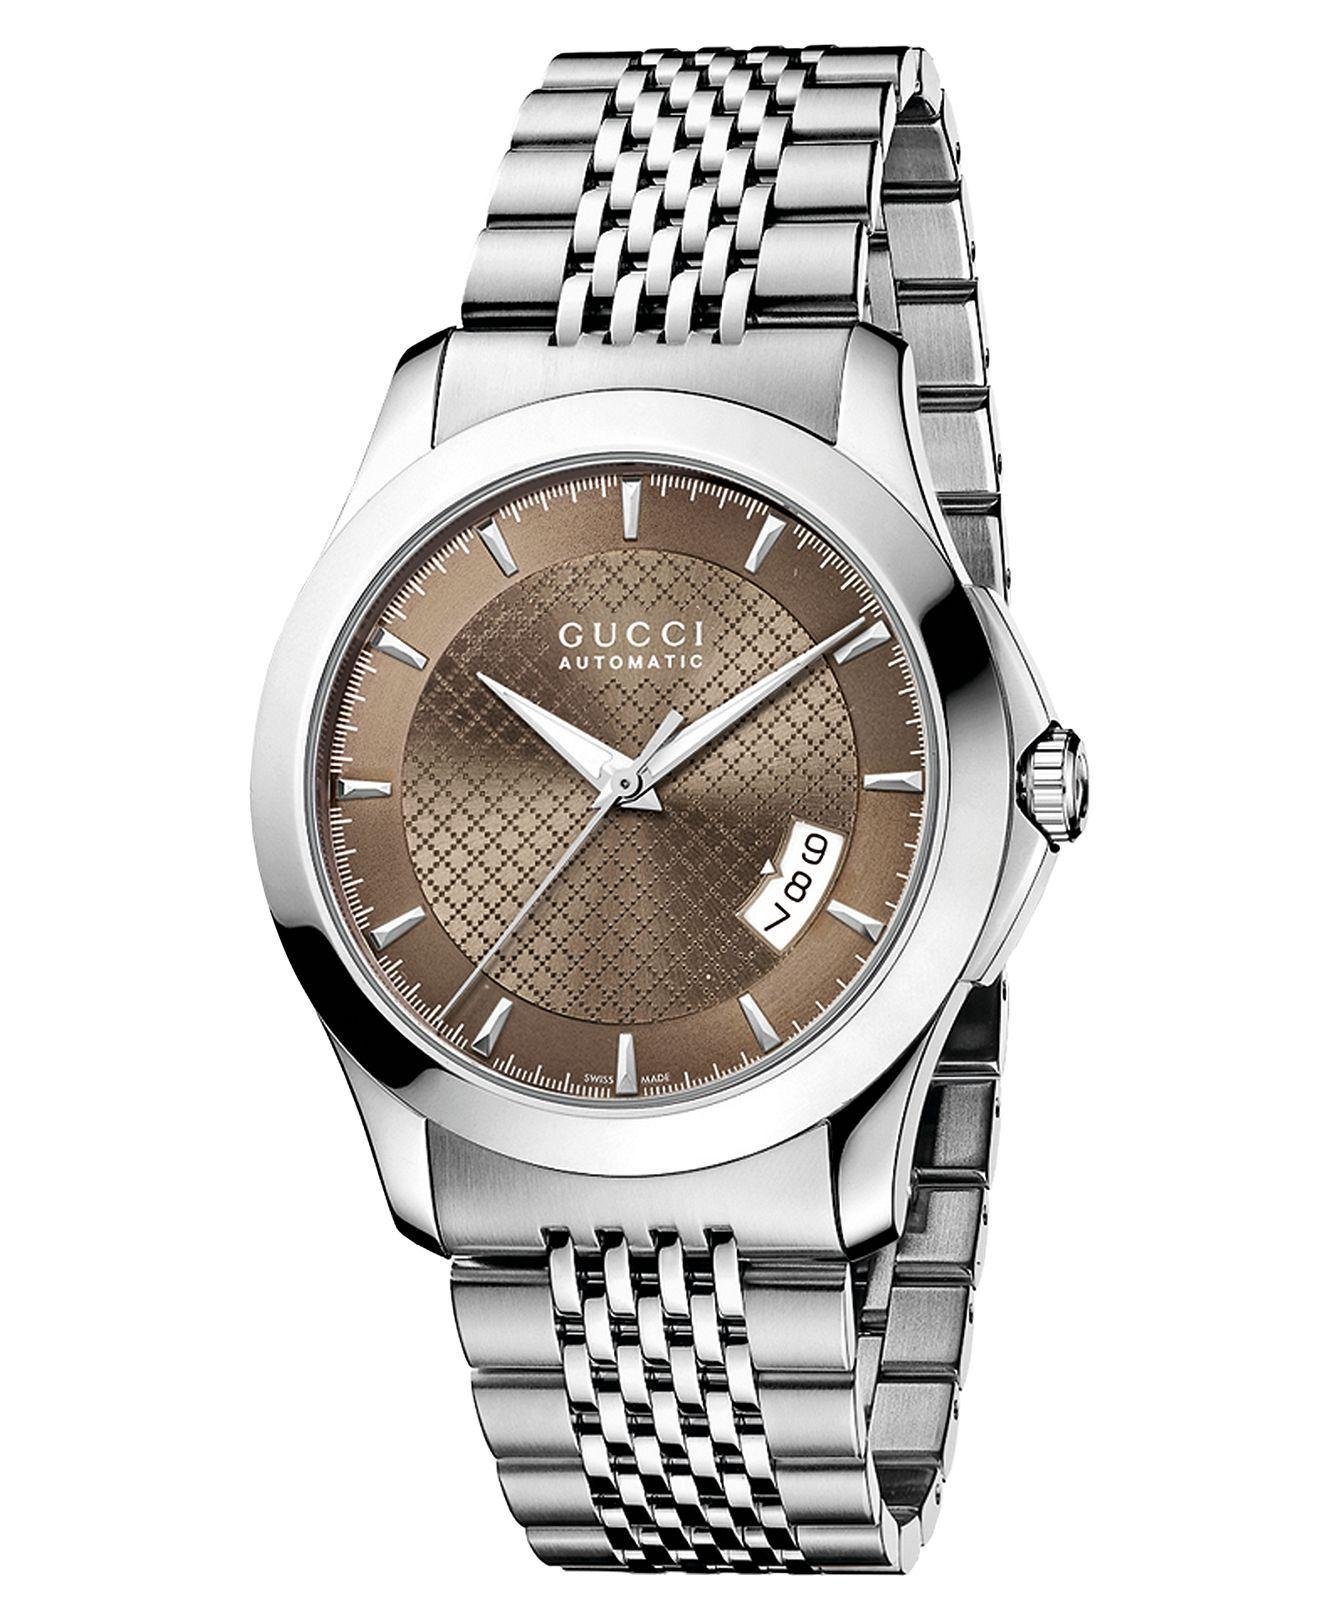 2a4bc8686d1 Gucci Watch